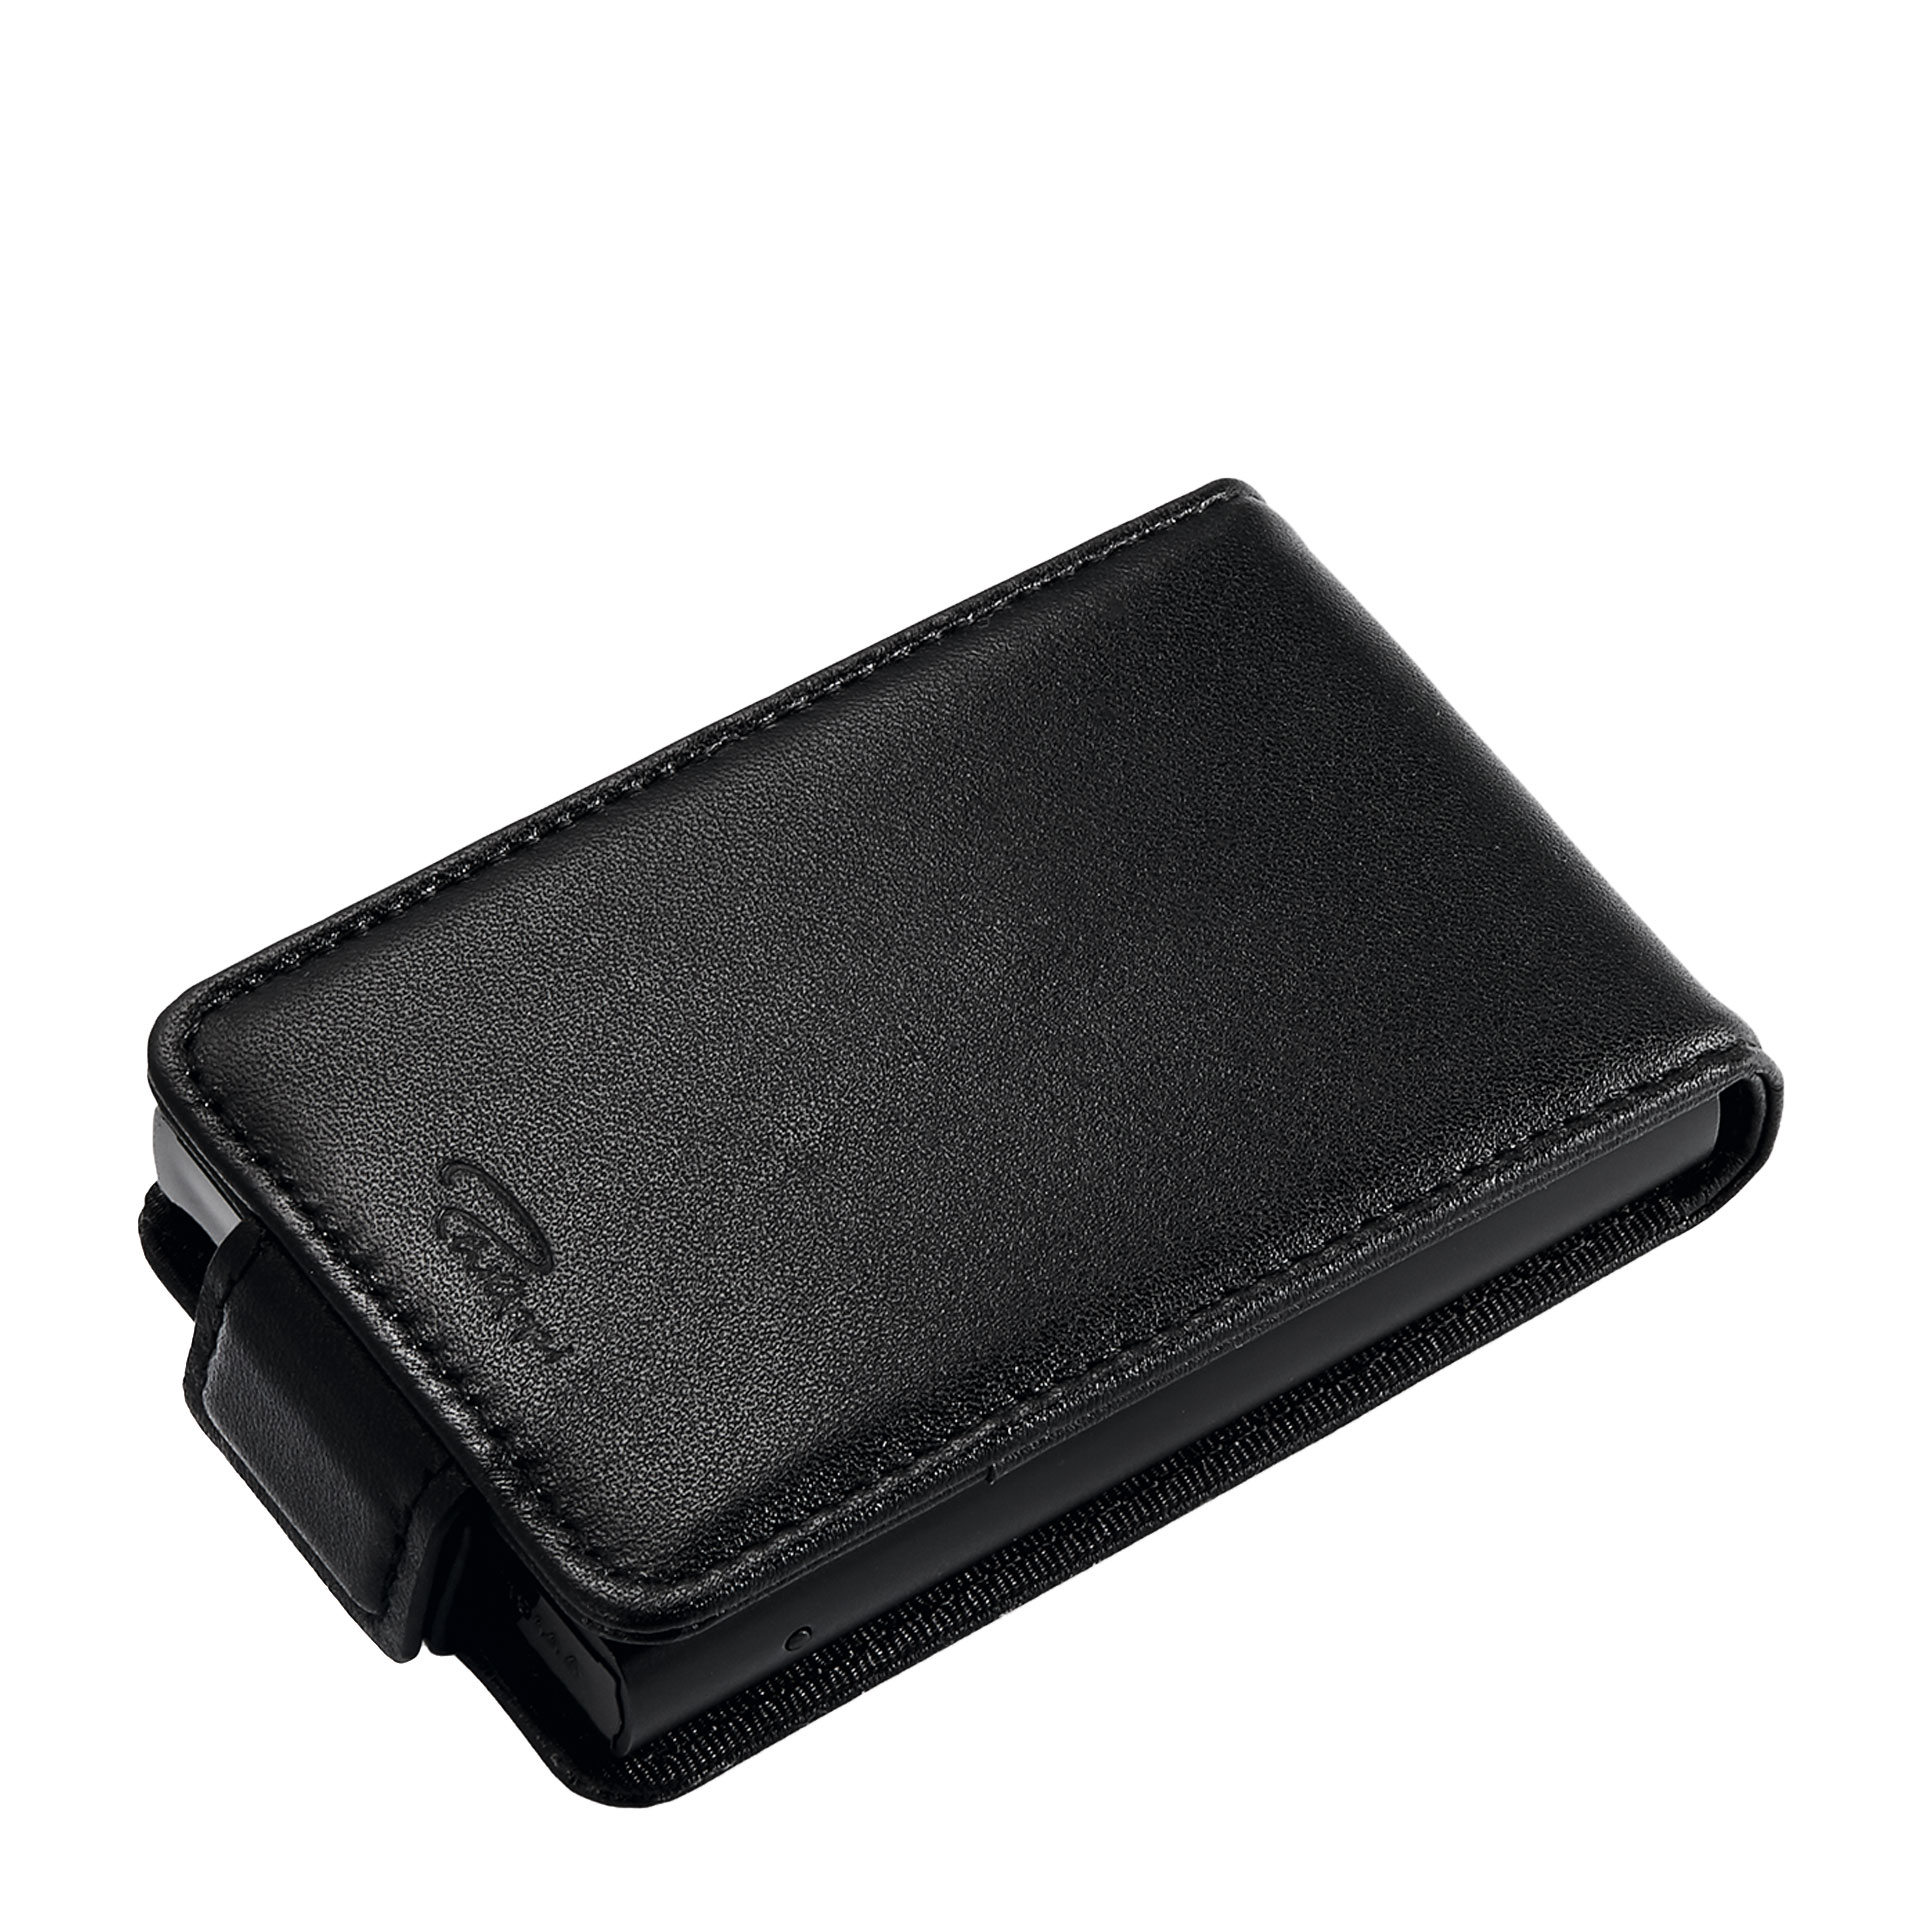 Philippi ECLIPSE Kreditkartensafe schwarz